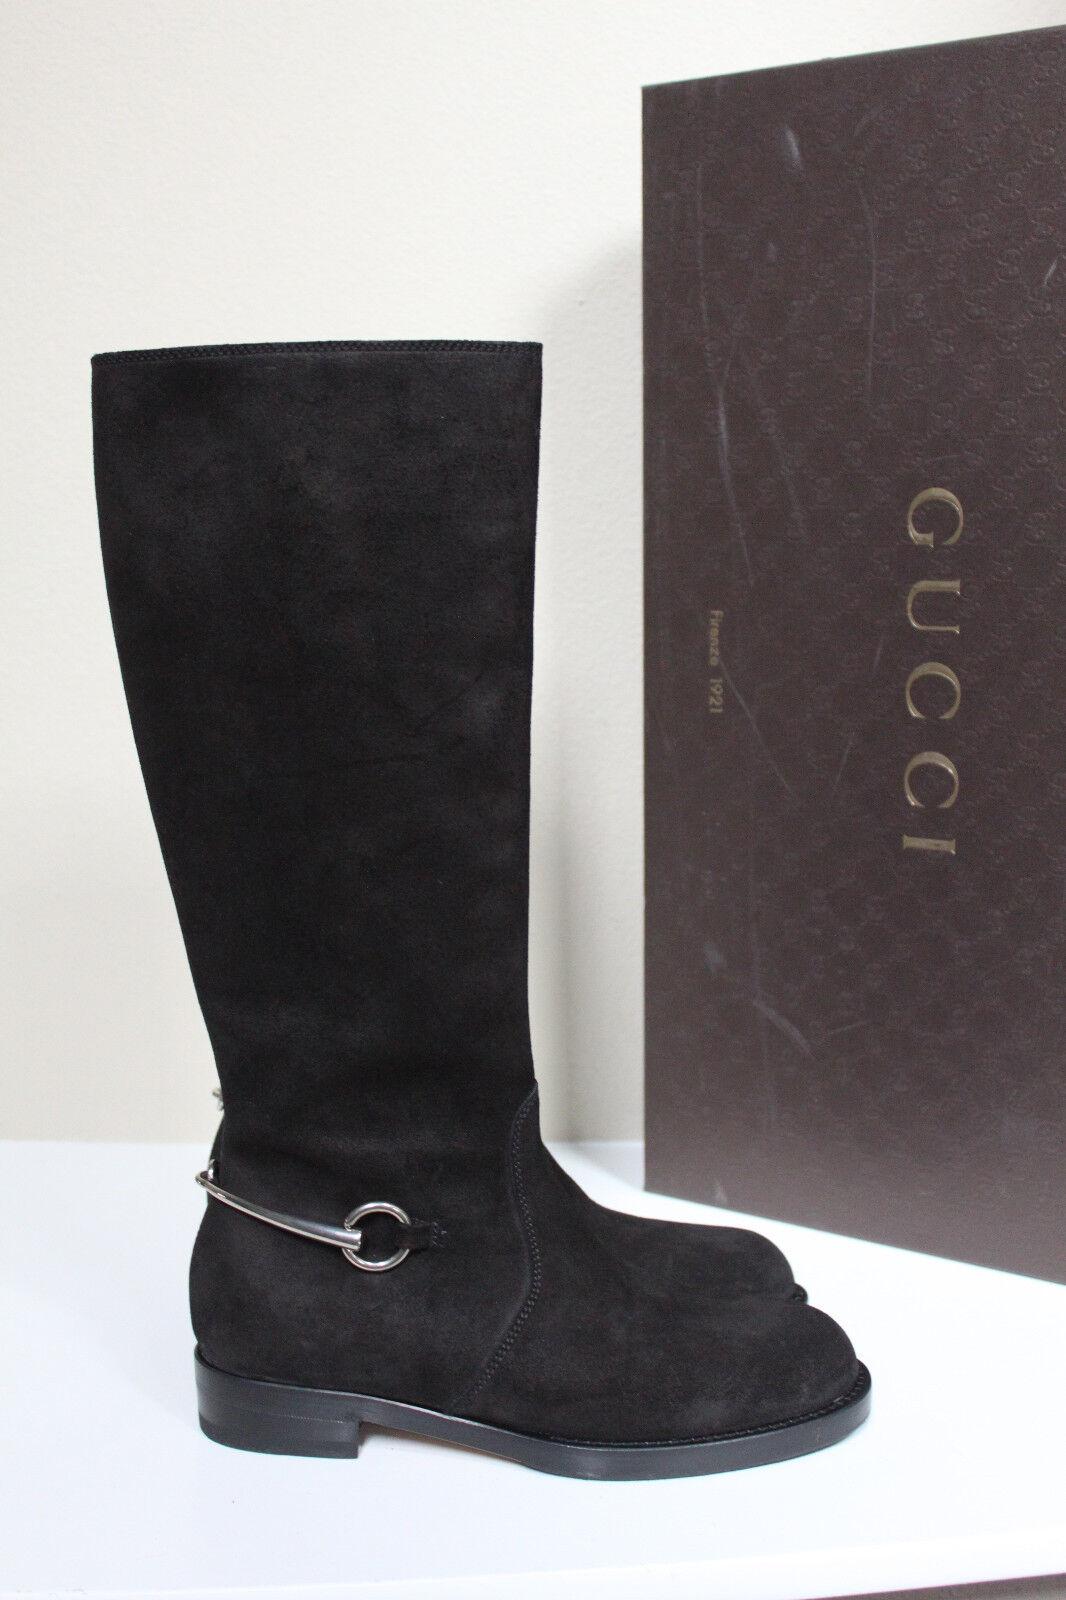 New sz 8 / 38 GUCCI Black Suede Horsebit Knee High Riding Boot Low Heel Shoes